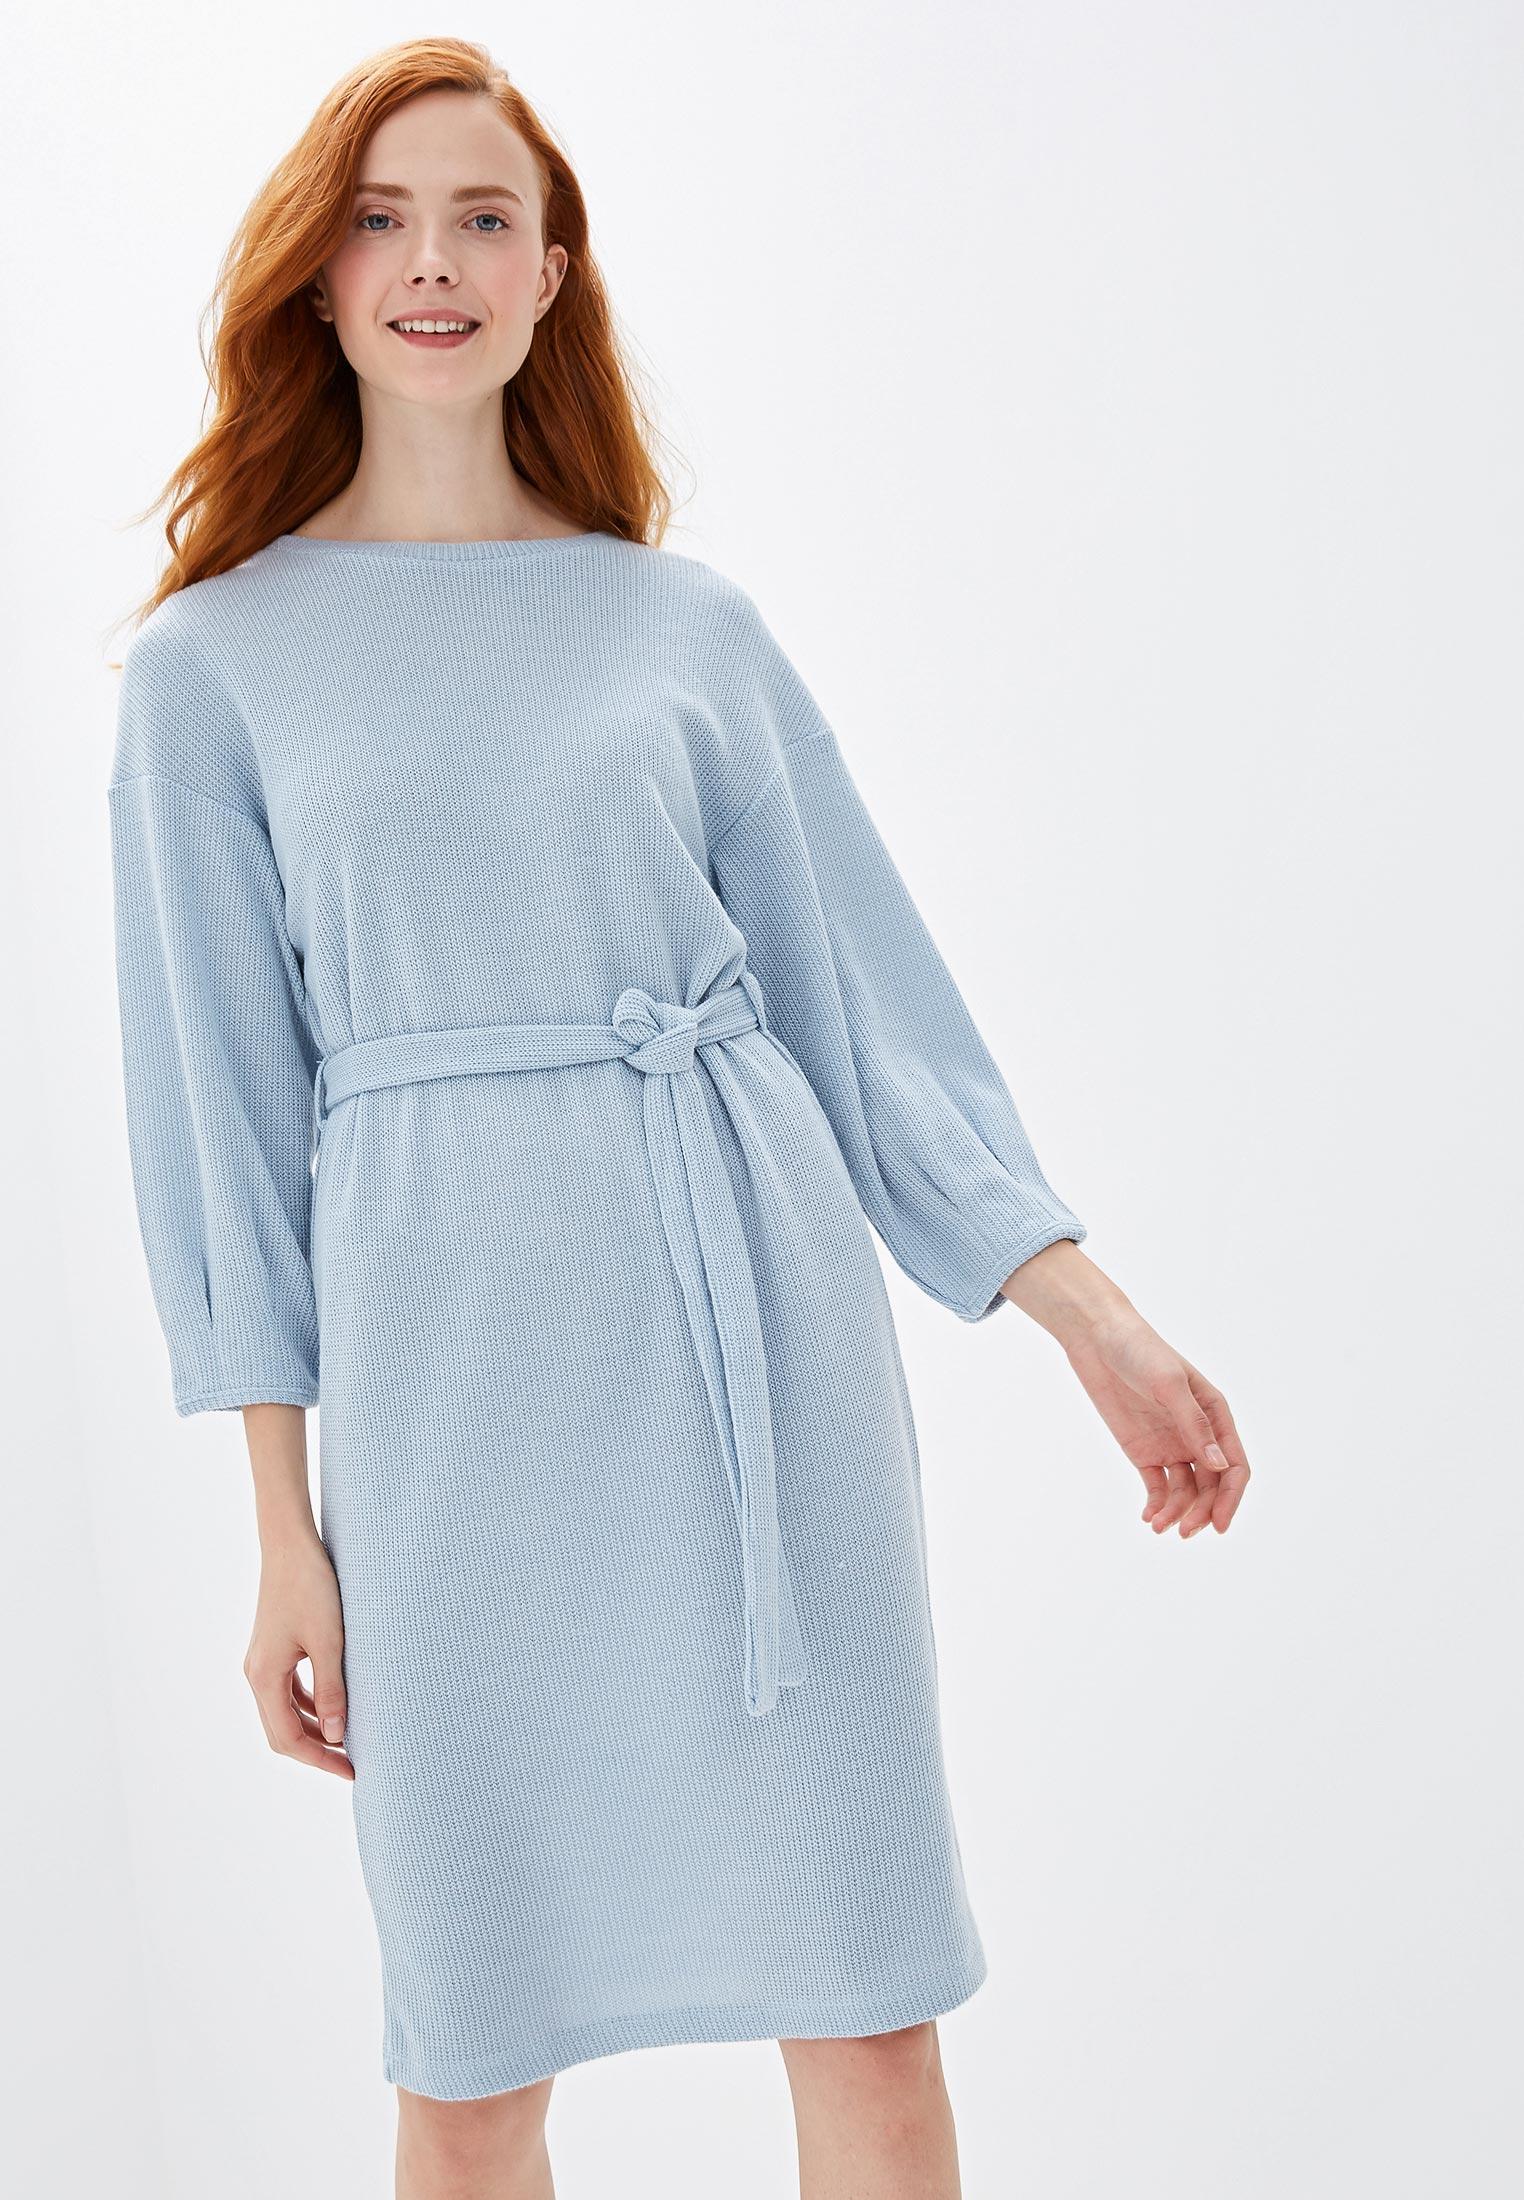 Вязаное платье Sela (Сэла) DK-117/1265-9331